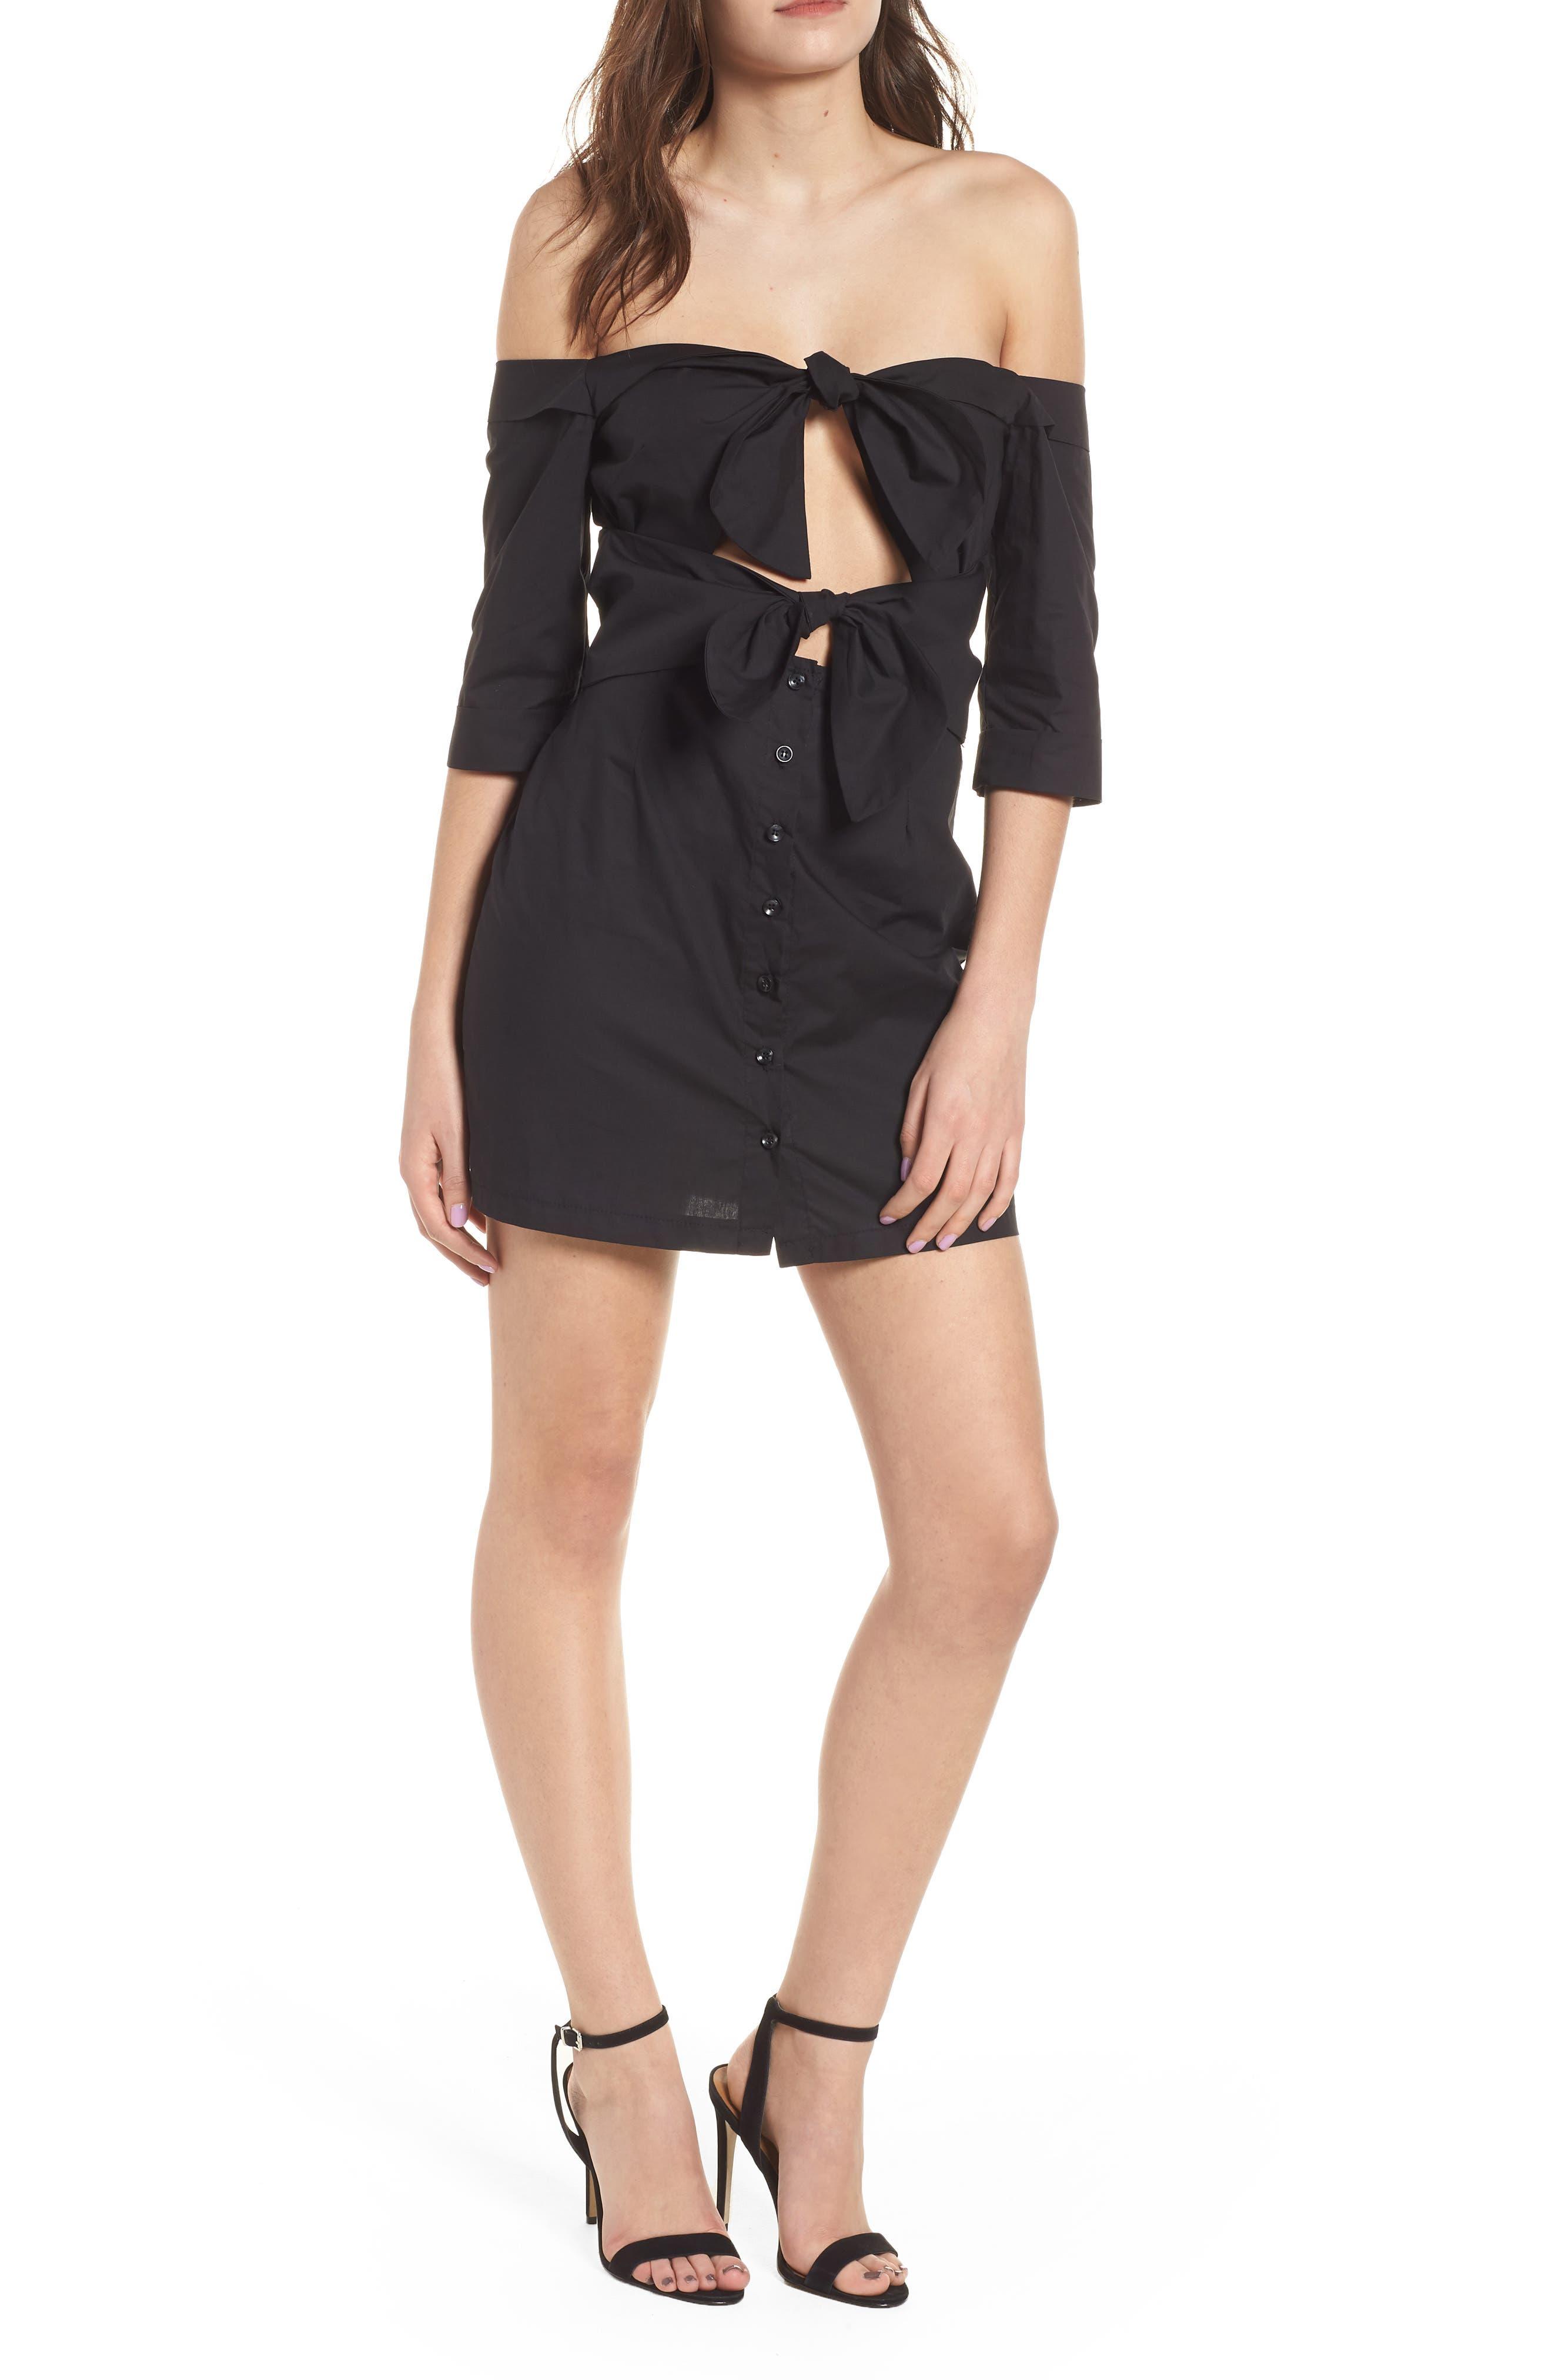 Ultimate Desire Off the Shoulder Minidress,                         Main,                         color, Black